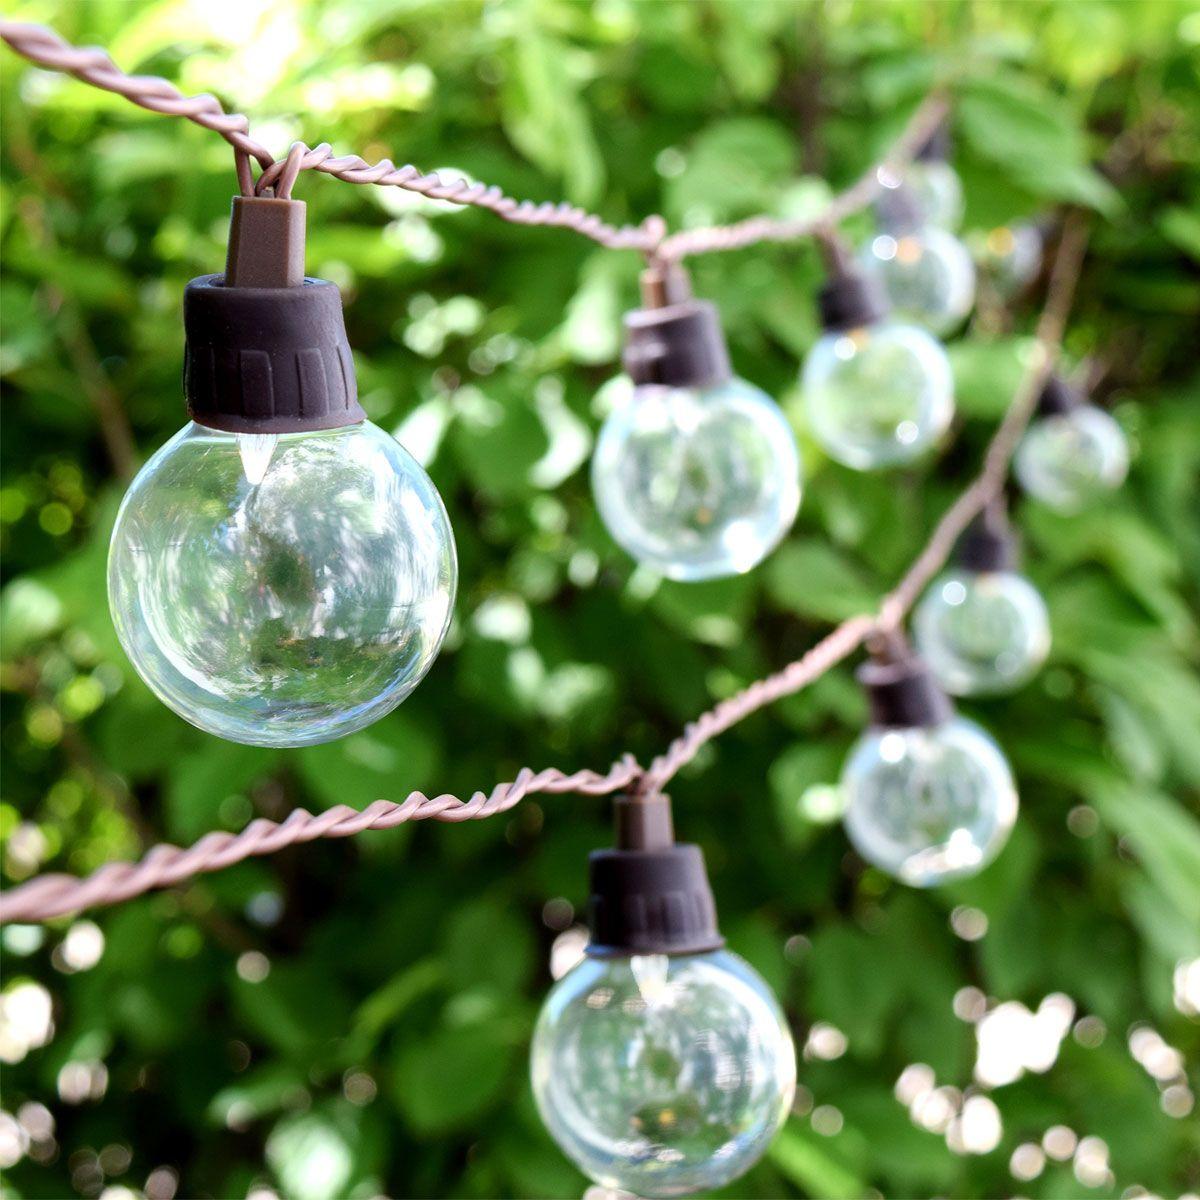 LED Solar Powered G40 String Lights 10 Lights outdoor